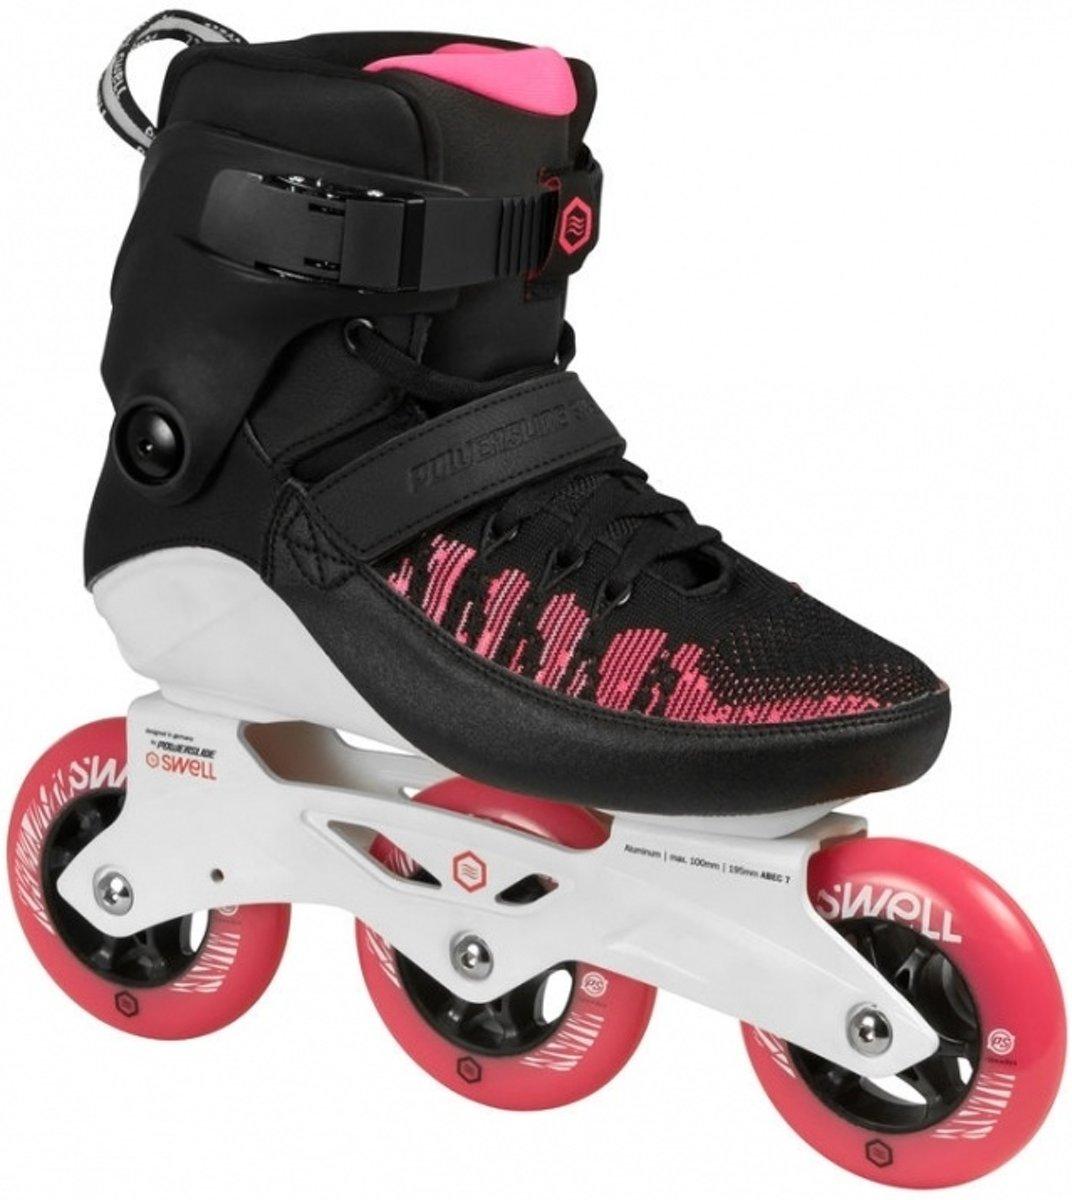 31e74f8004f bol.com | Powerslide Inline Skates Swell Dames Zwart/roze Maat 37